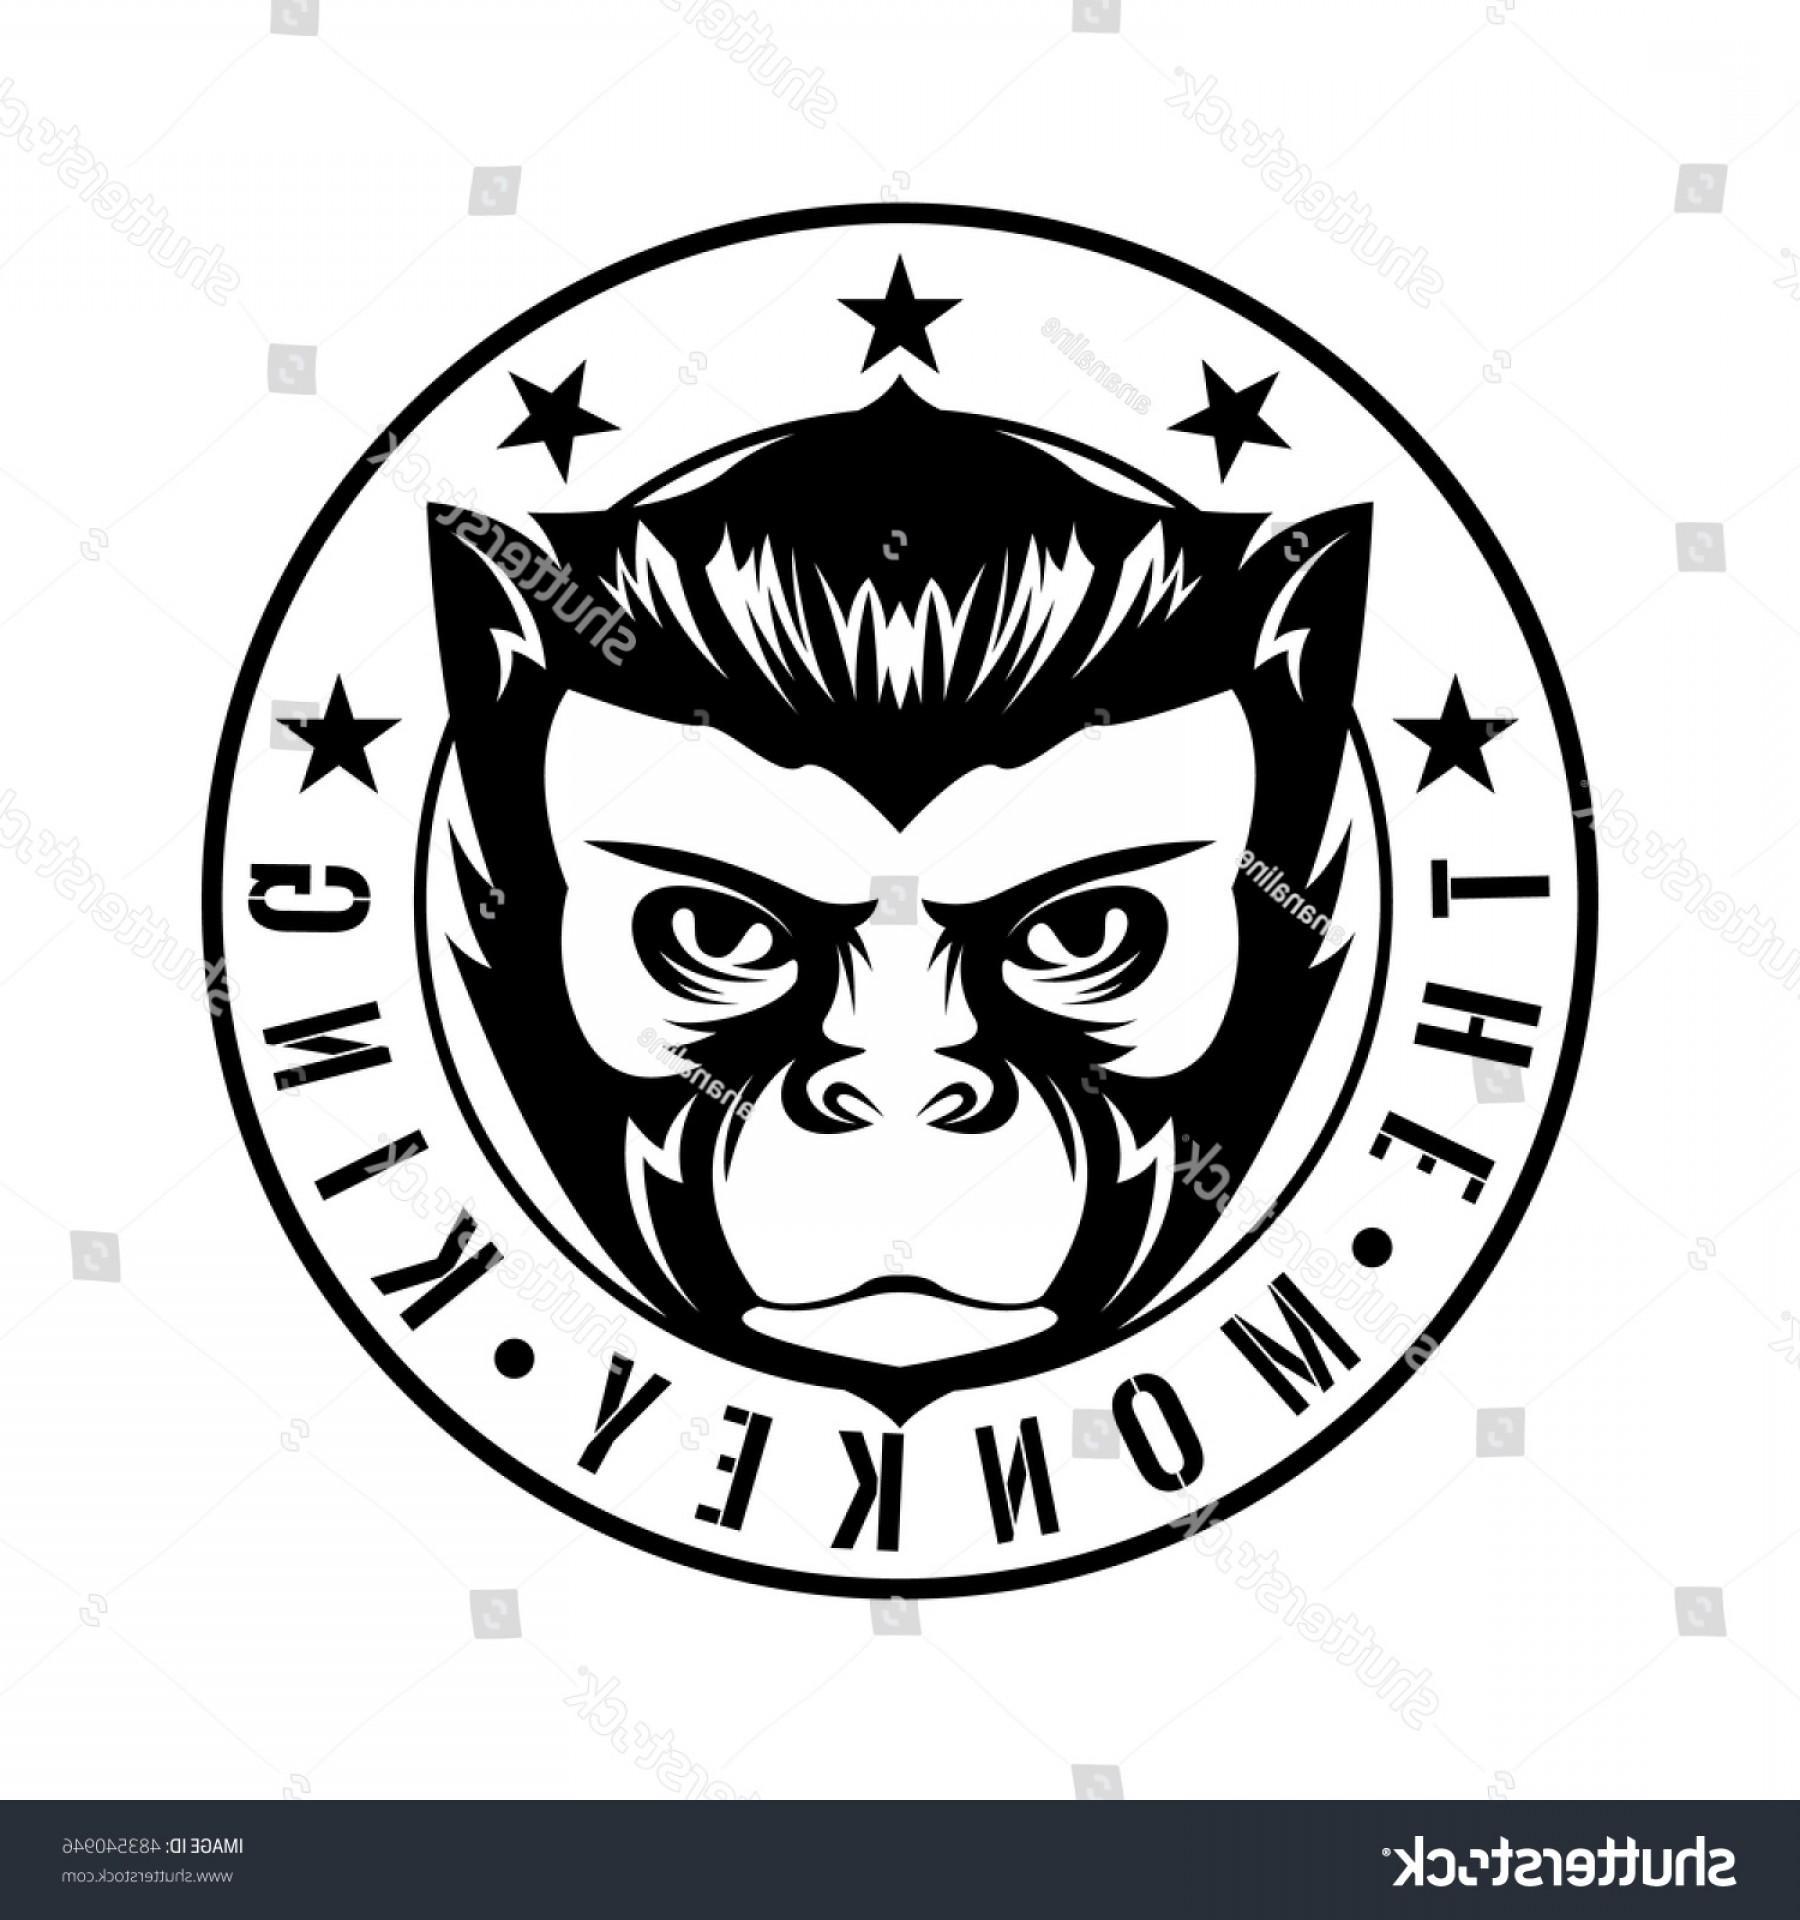 1800x1920 Evil King Vector Designs Lazttweet